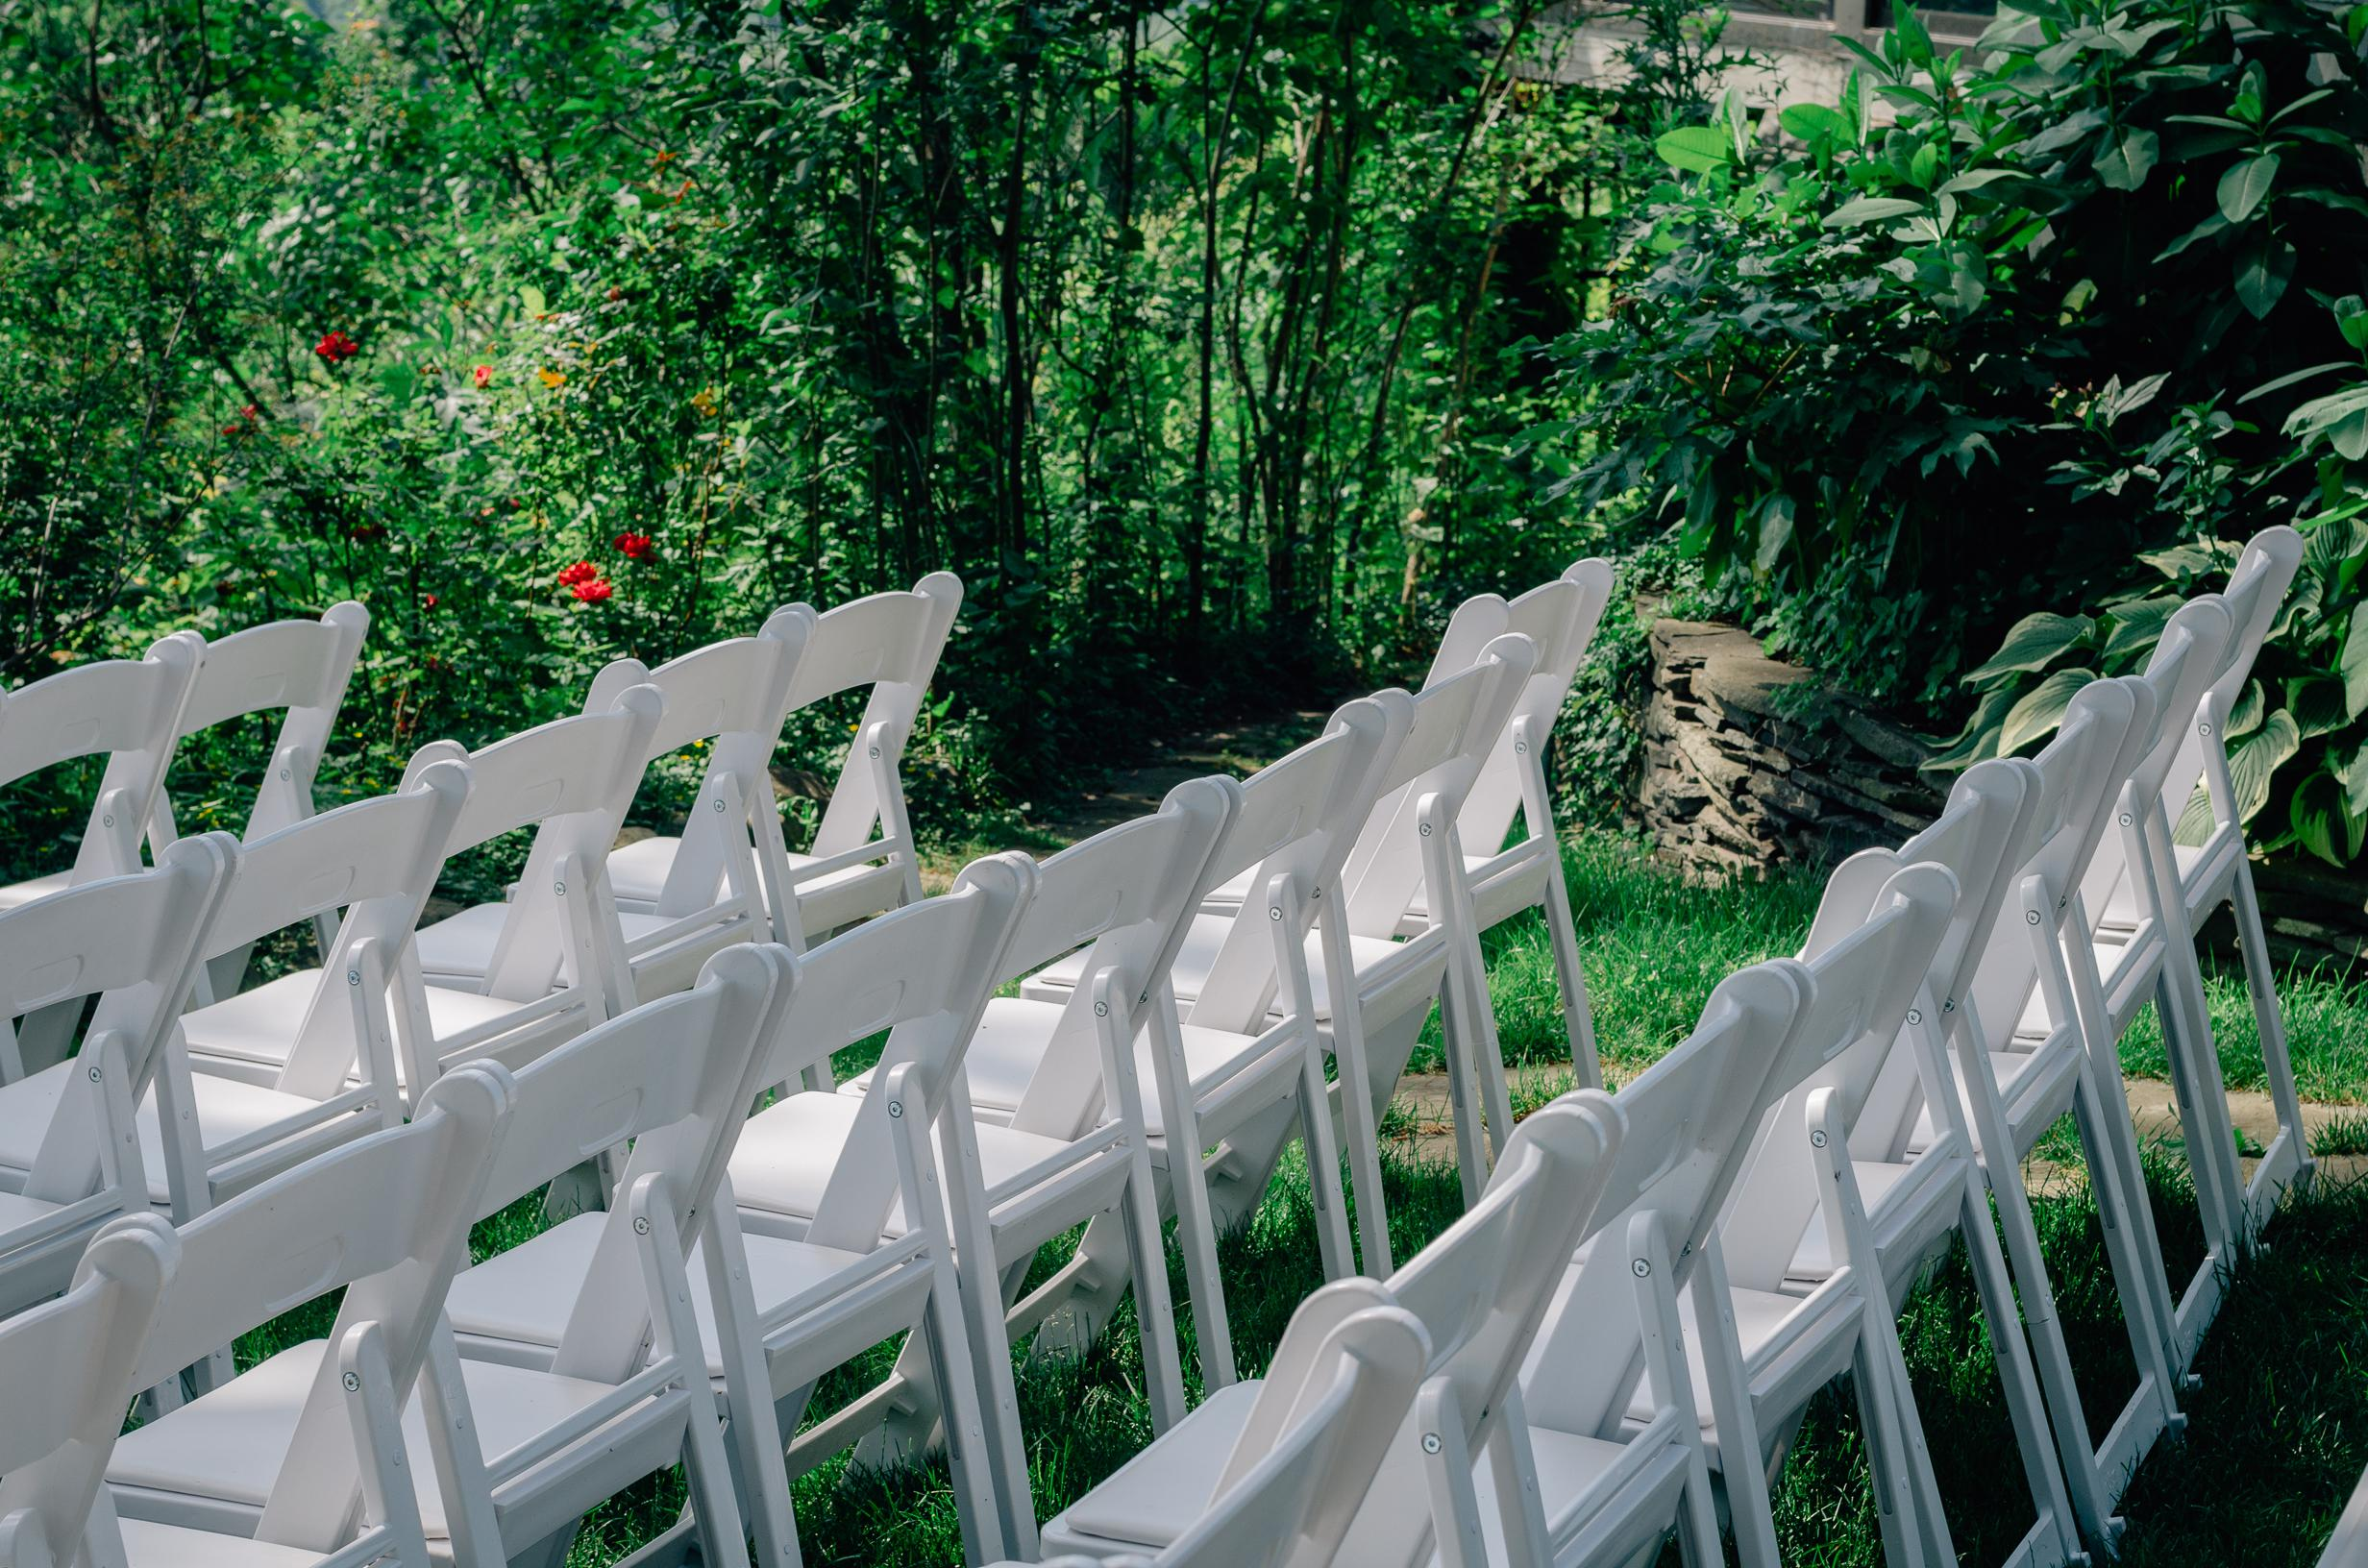 SamErica Wedding in Upstate New York - 2012-0616-DSC_2899_97419